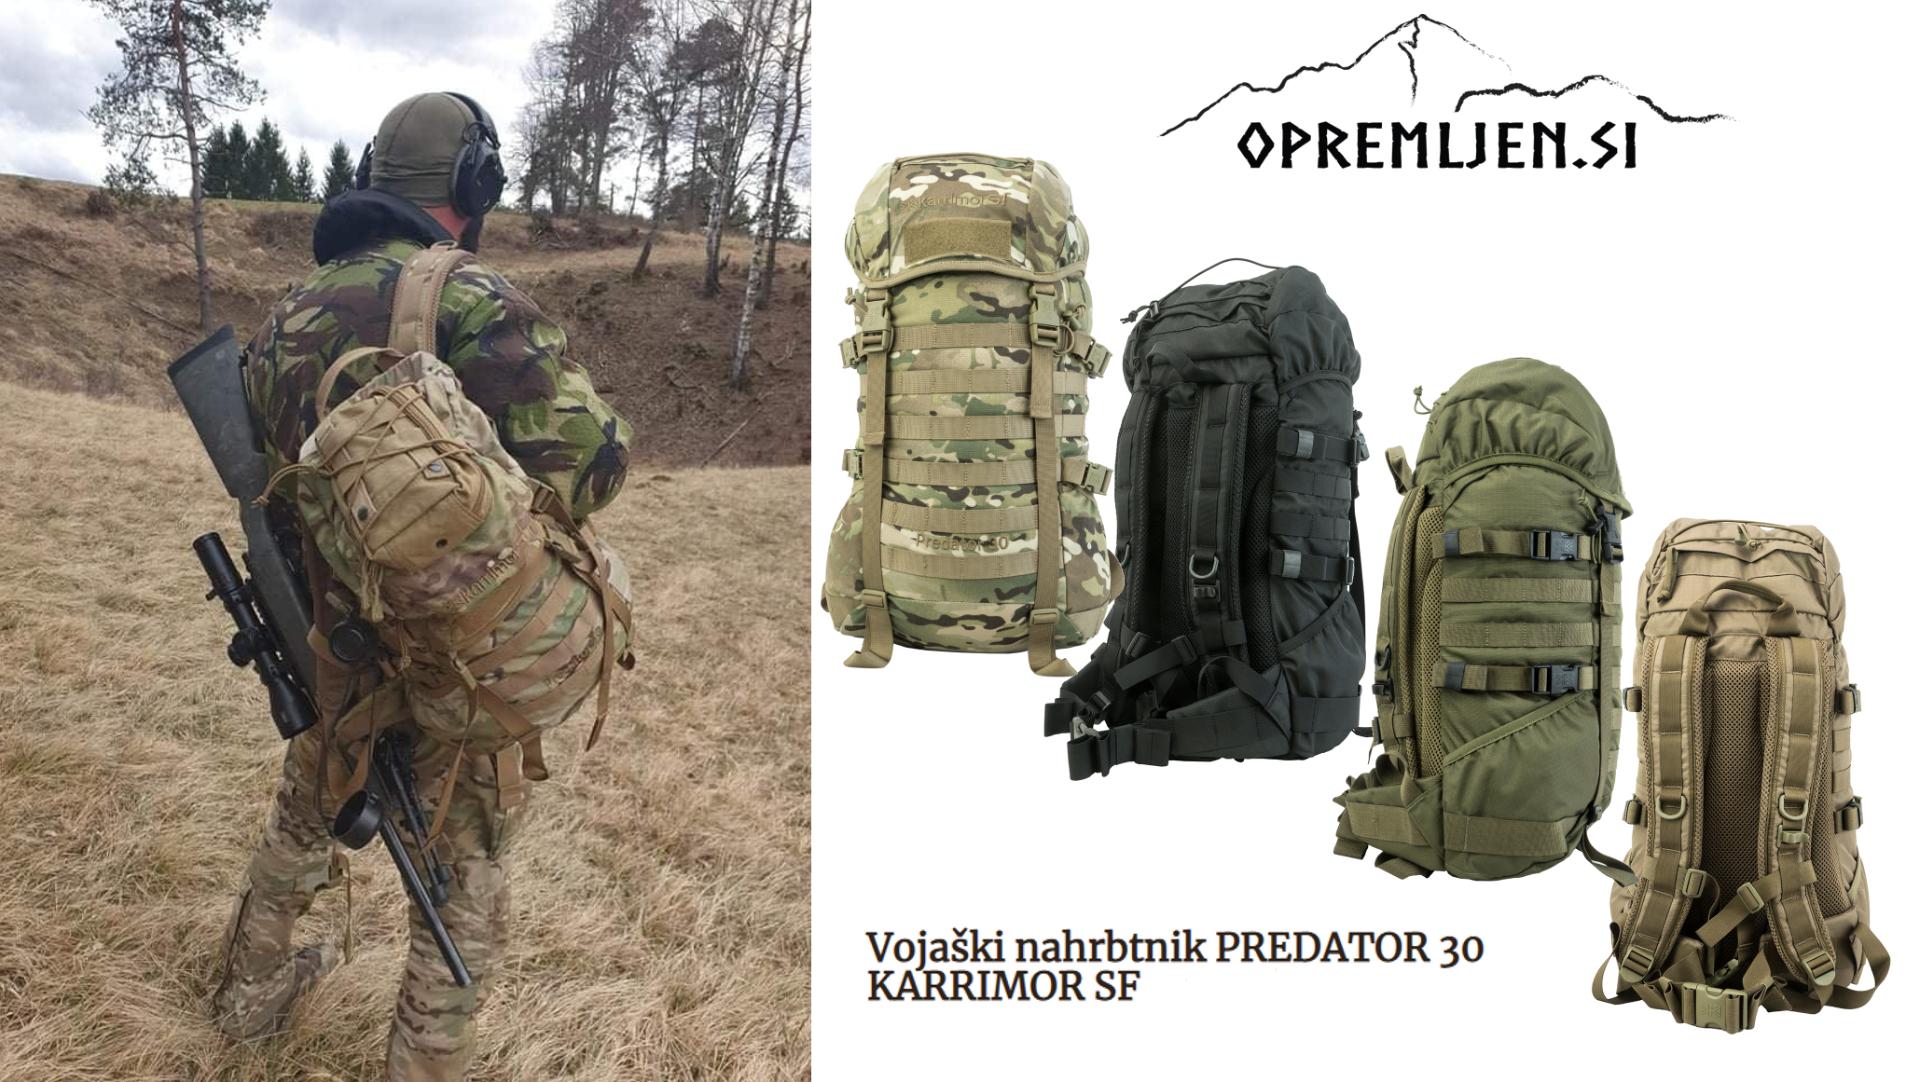 Vojaški nahrbtniki, Karrimor SF, B33 army shop, Trgovina z vojaško opremo, Vojaška trgovina